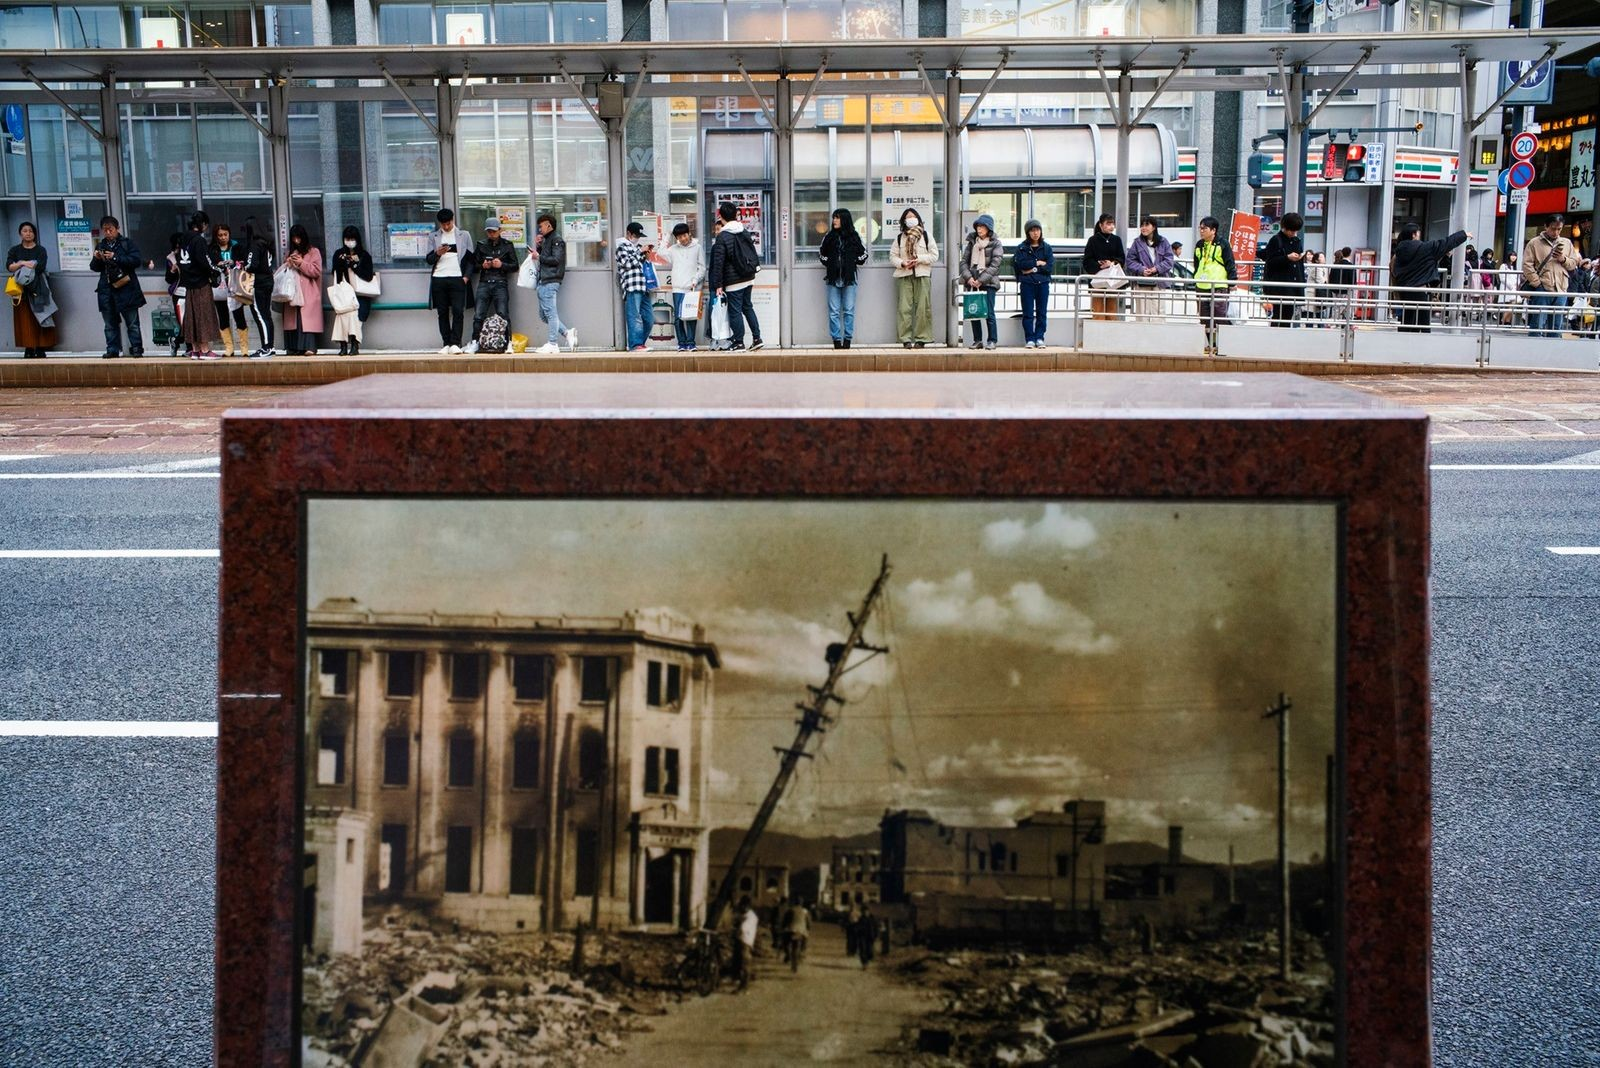 Cidade japonesa de Hiroshima 75 anos após o ataque de bomba atômica (Foto: Hiroki Kobayashi / National Geographic)